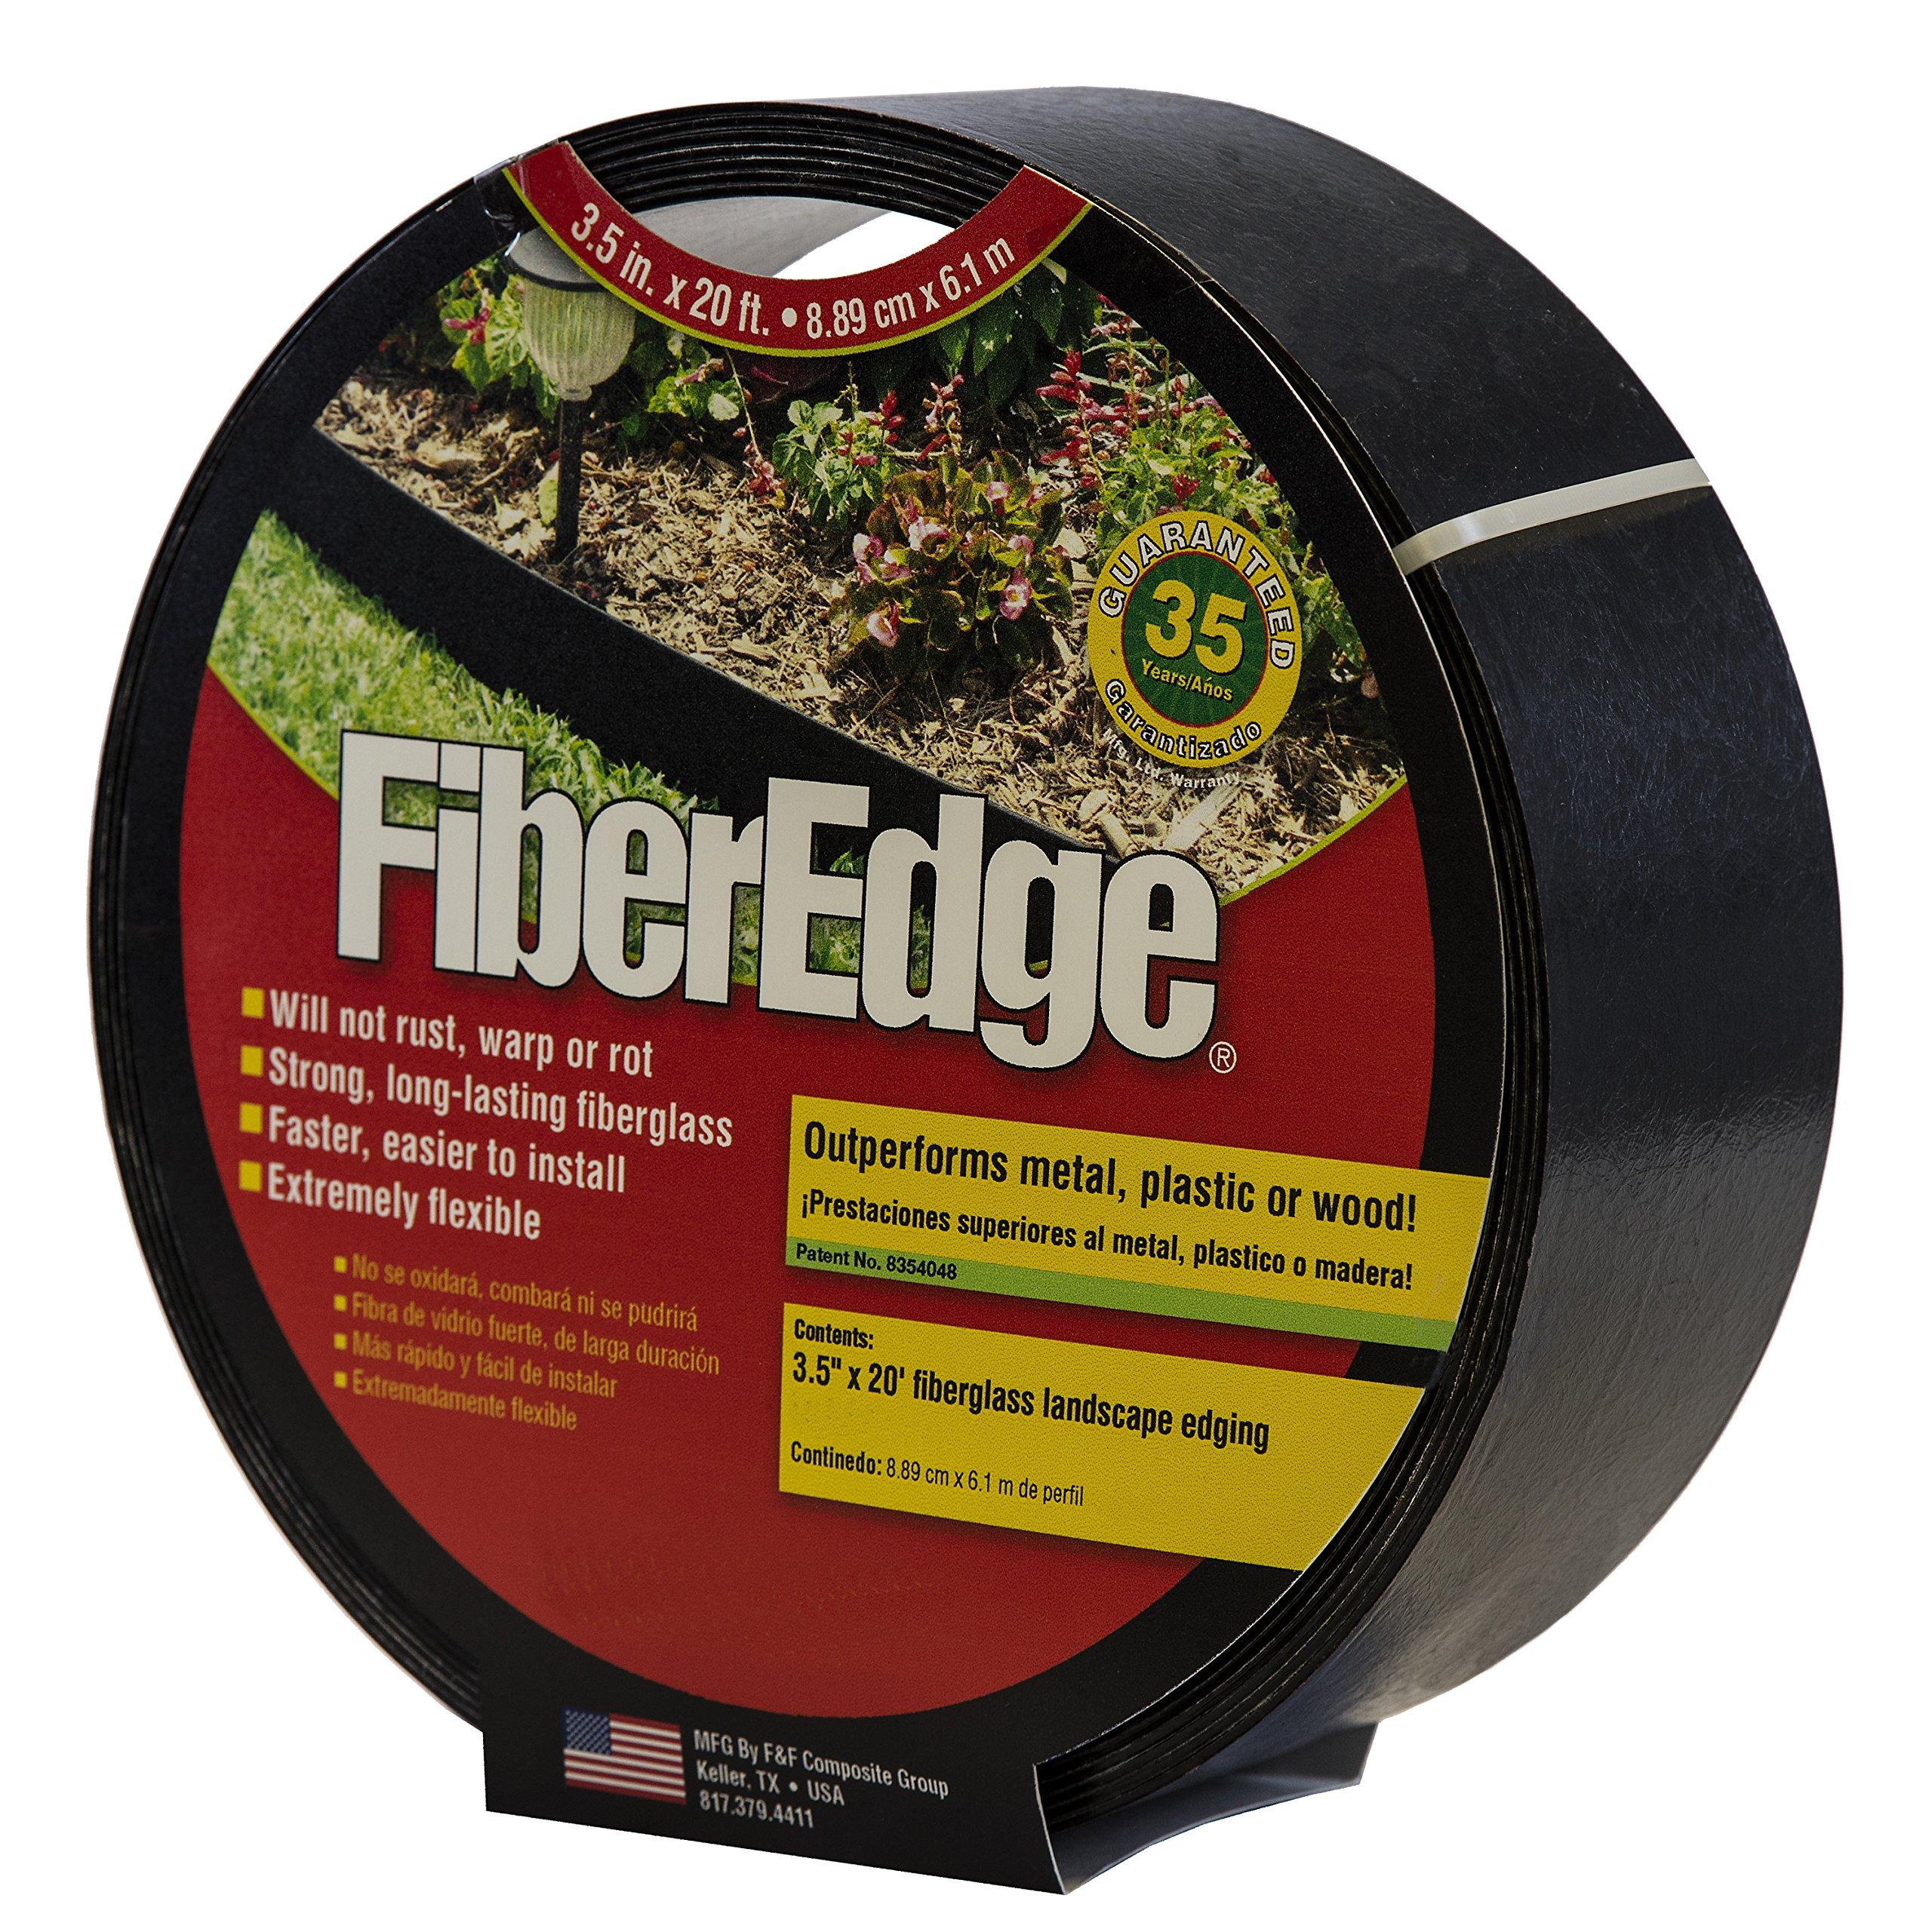 FiberEdge 3.5'' x 20 ft Fiberglass Landscape Edging